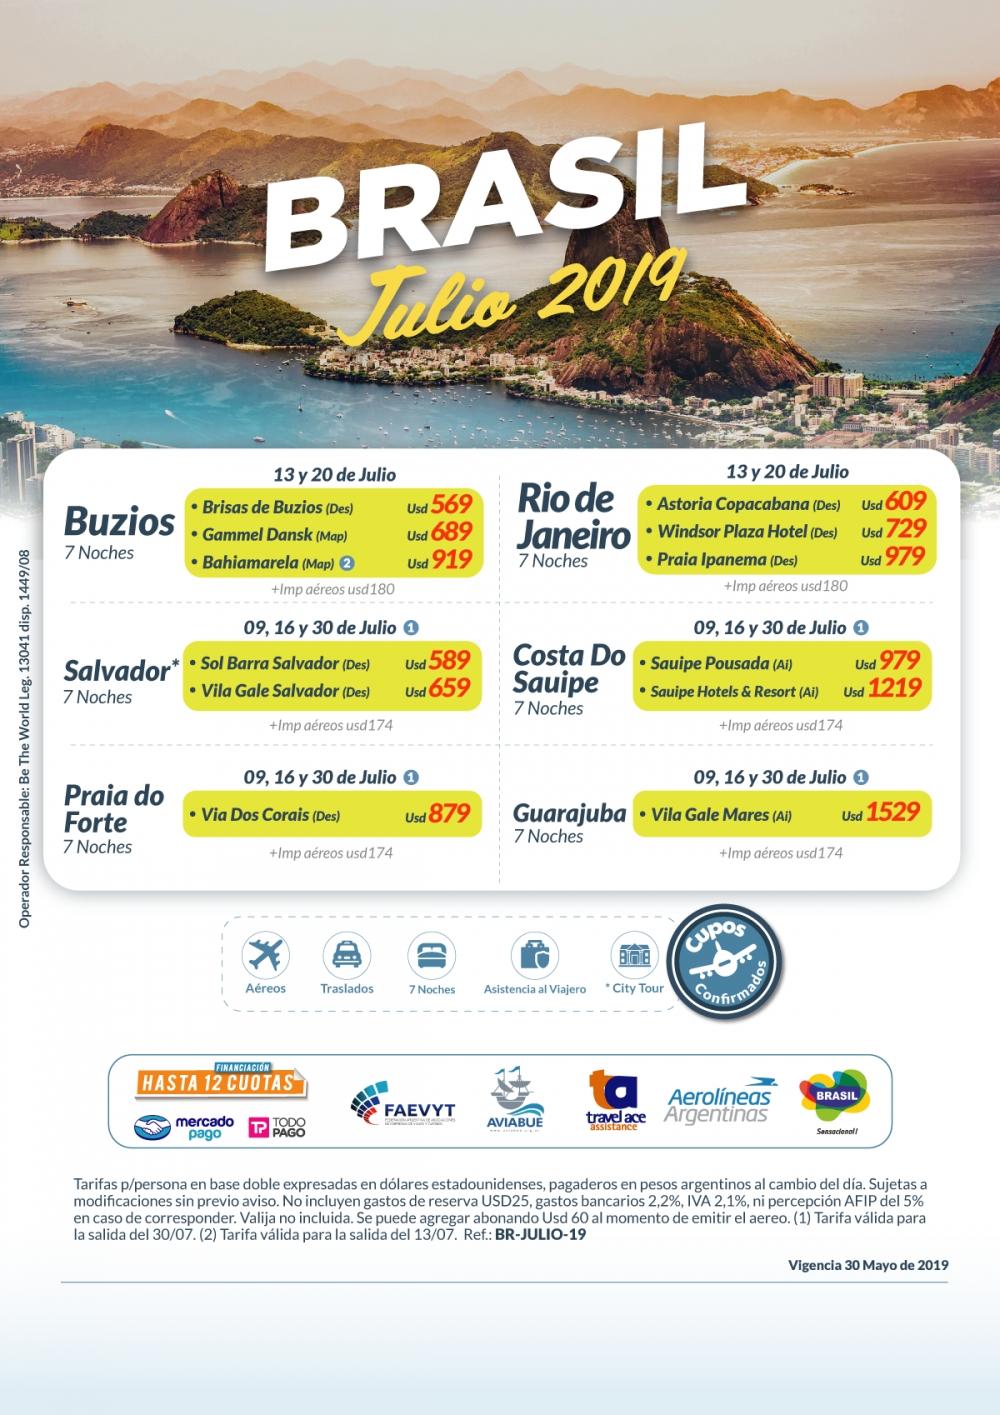 BRASIL - Julio 2019 - Cupos Confirmados